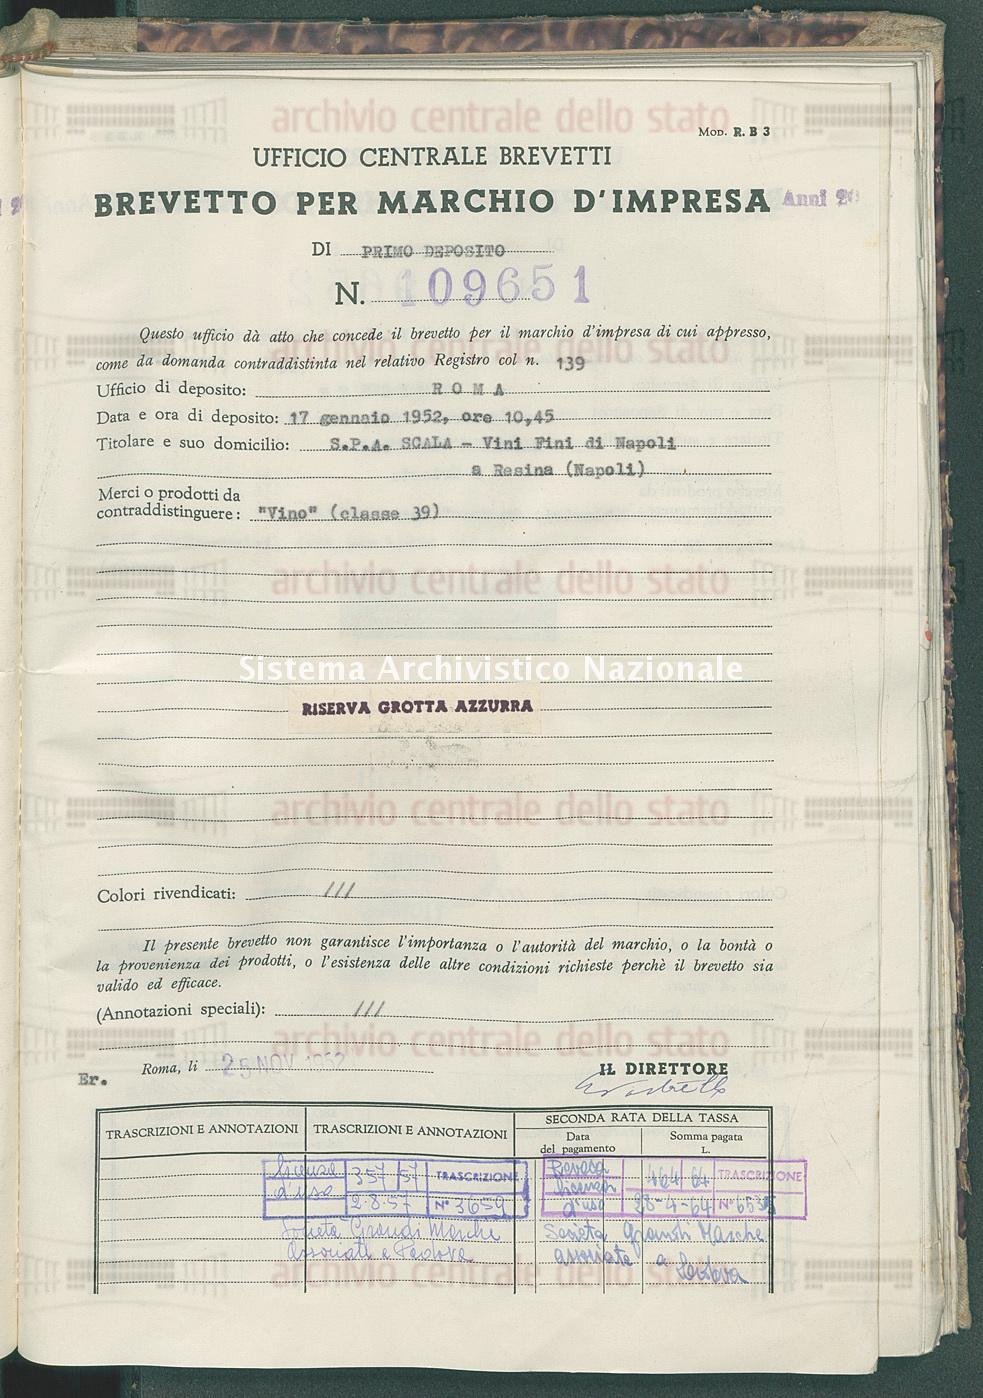 'Vino' S.P.A. Scala - Vini Fini (25/11/1952)